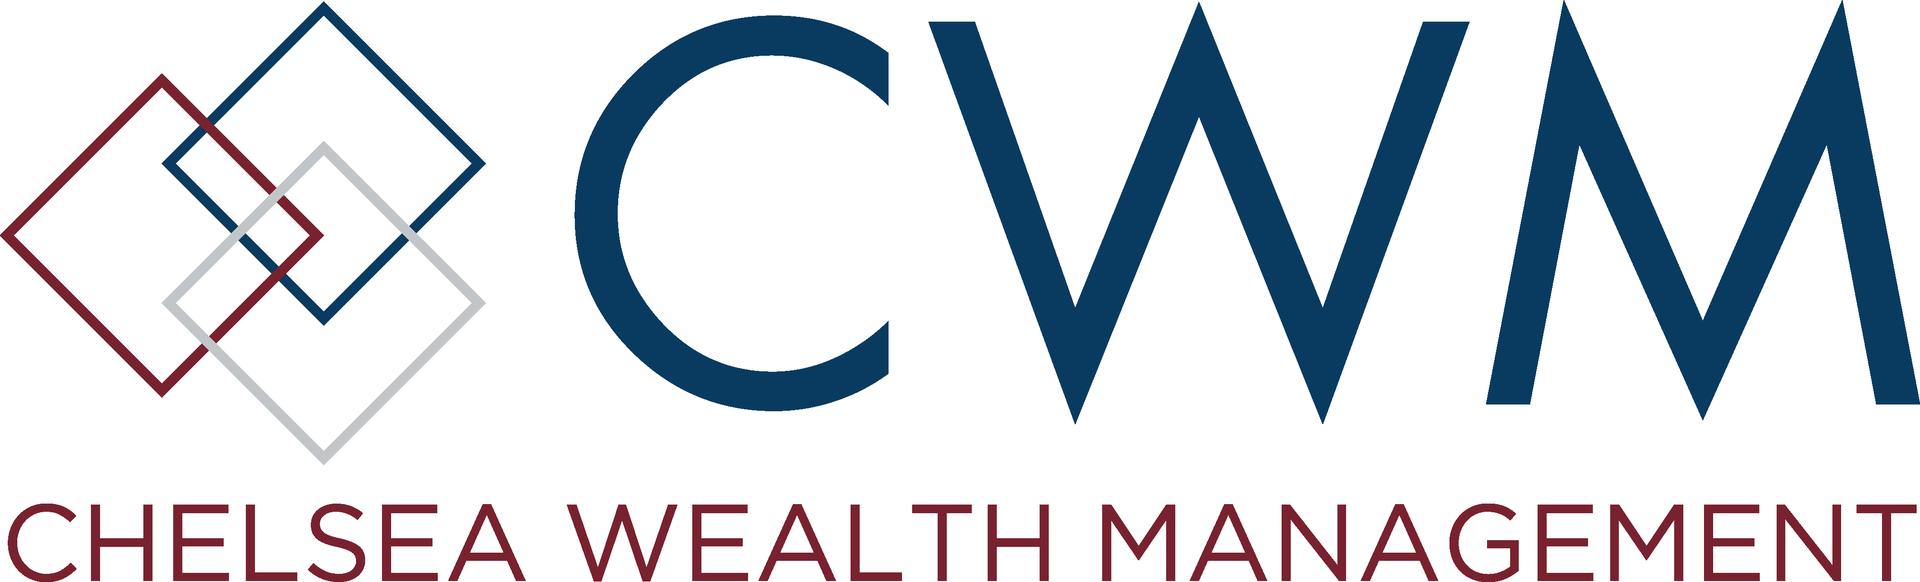 Chelsea Wealth Management